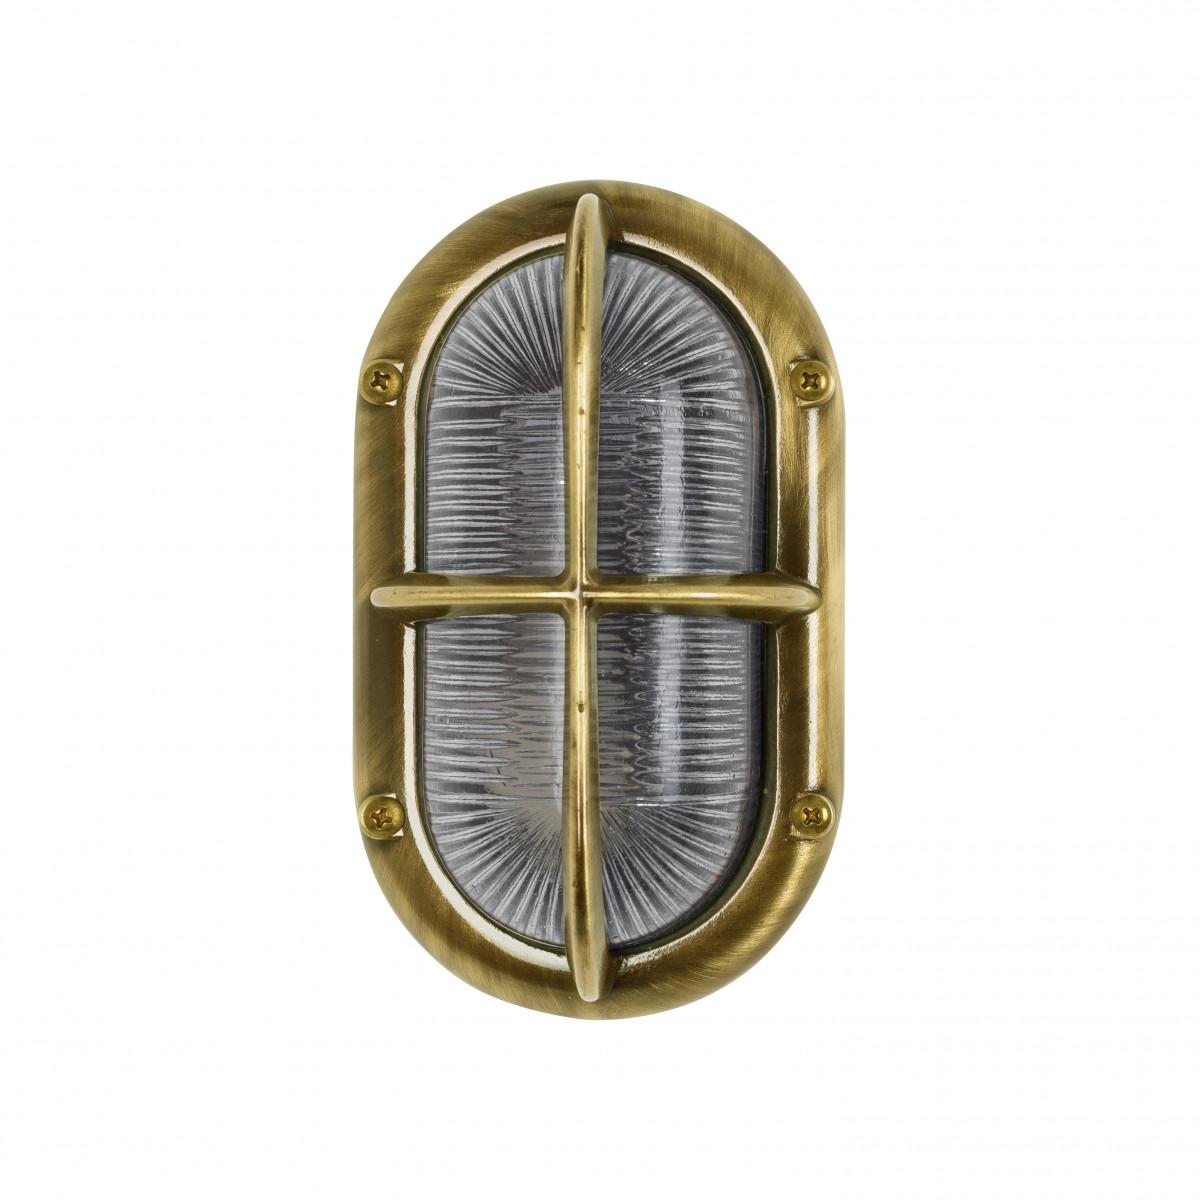 scheepsverlichting zeebestendig - Oculus Brons (6679) - KS Verlichting - Maritiem - scheepslamp - Nostalux